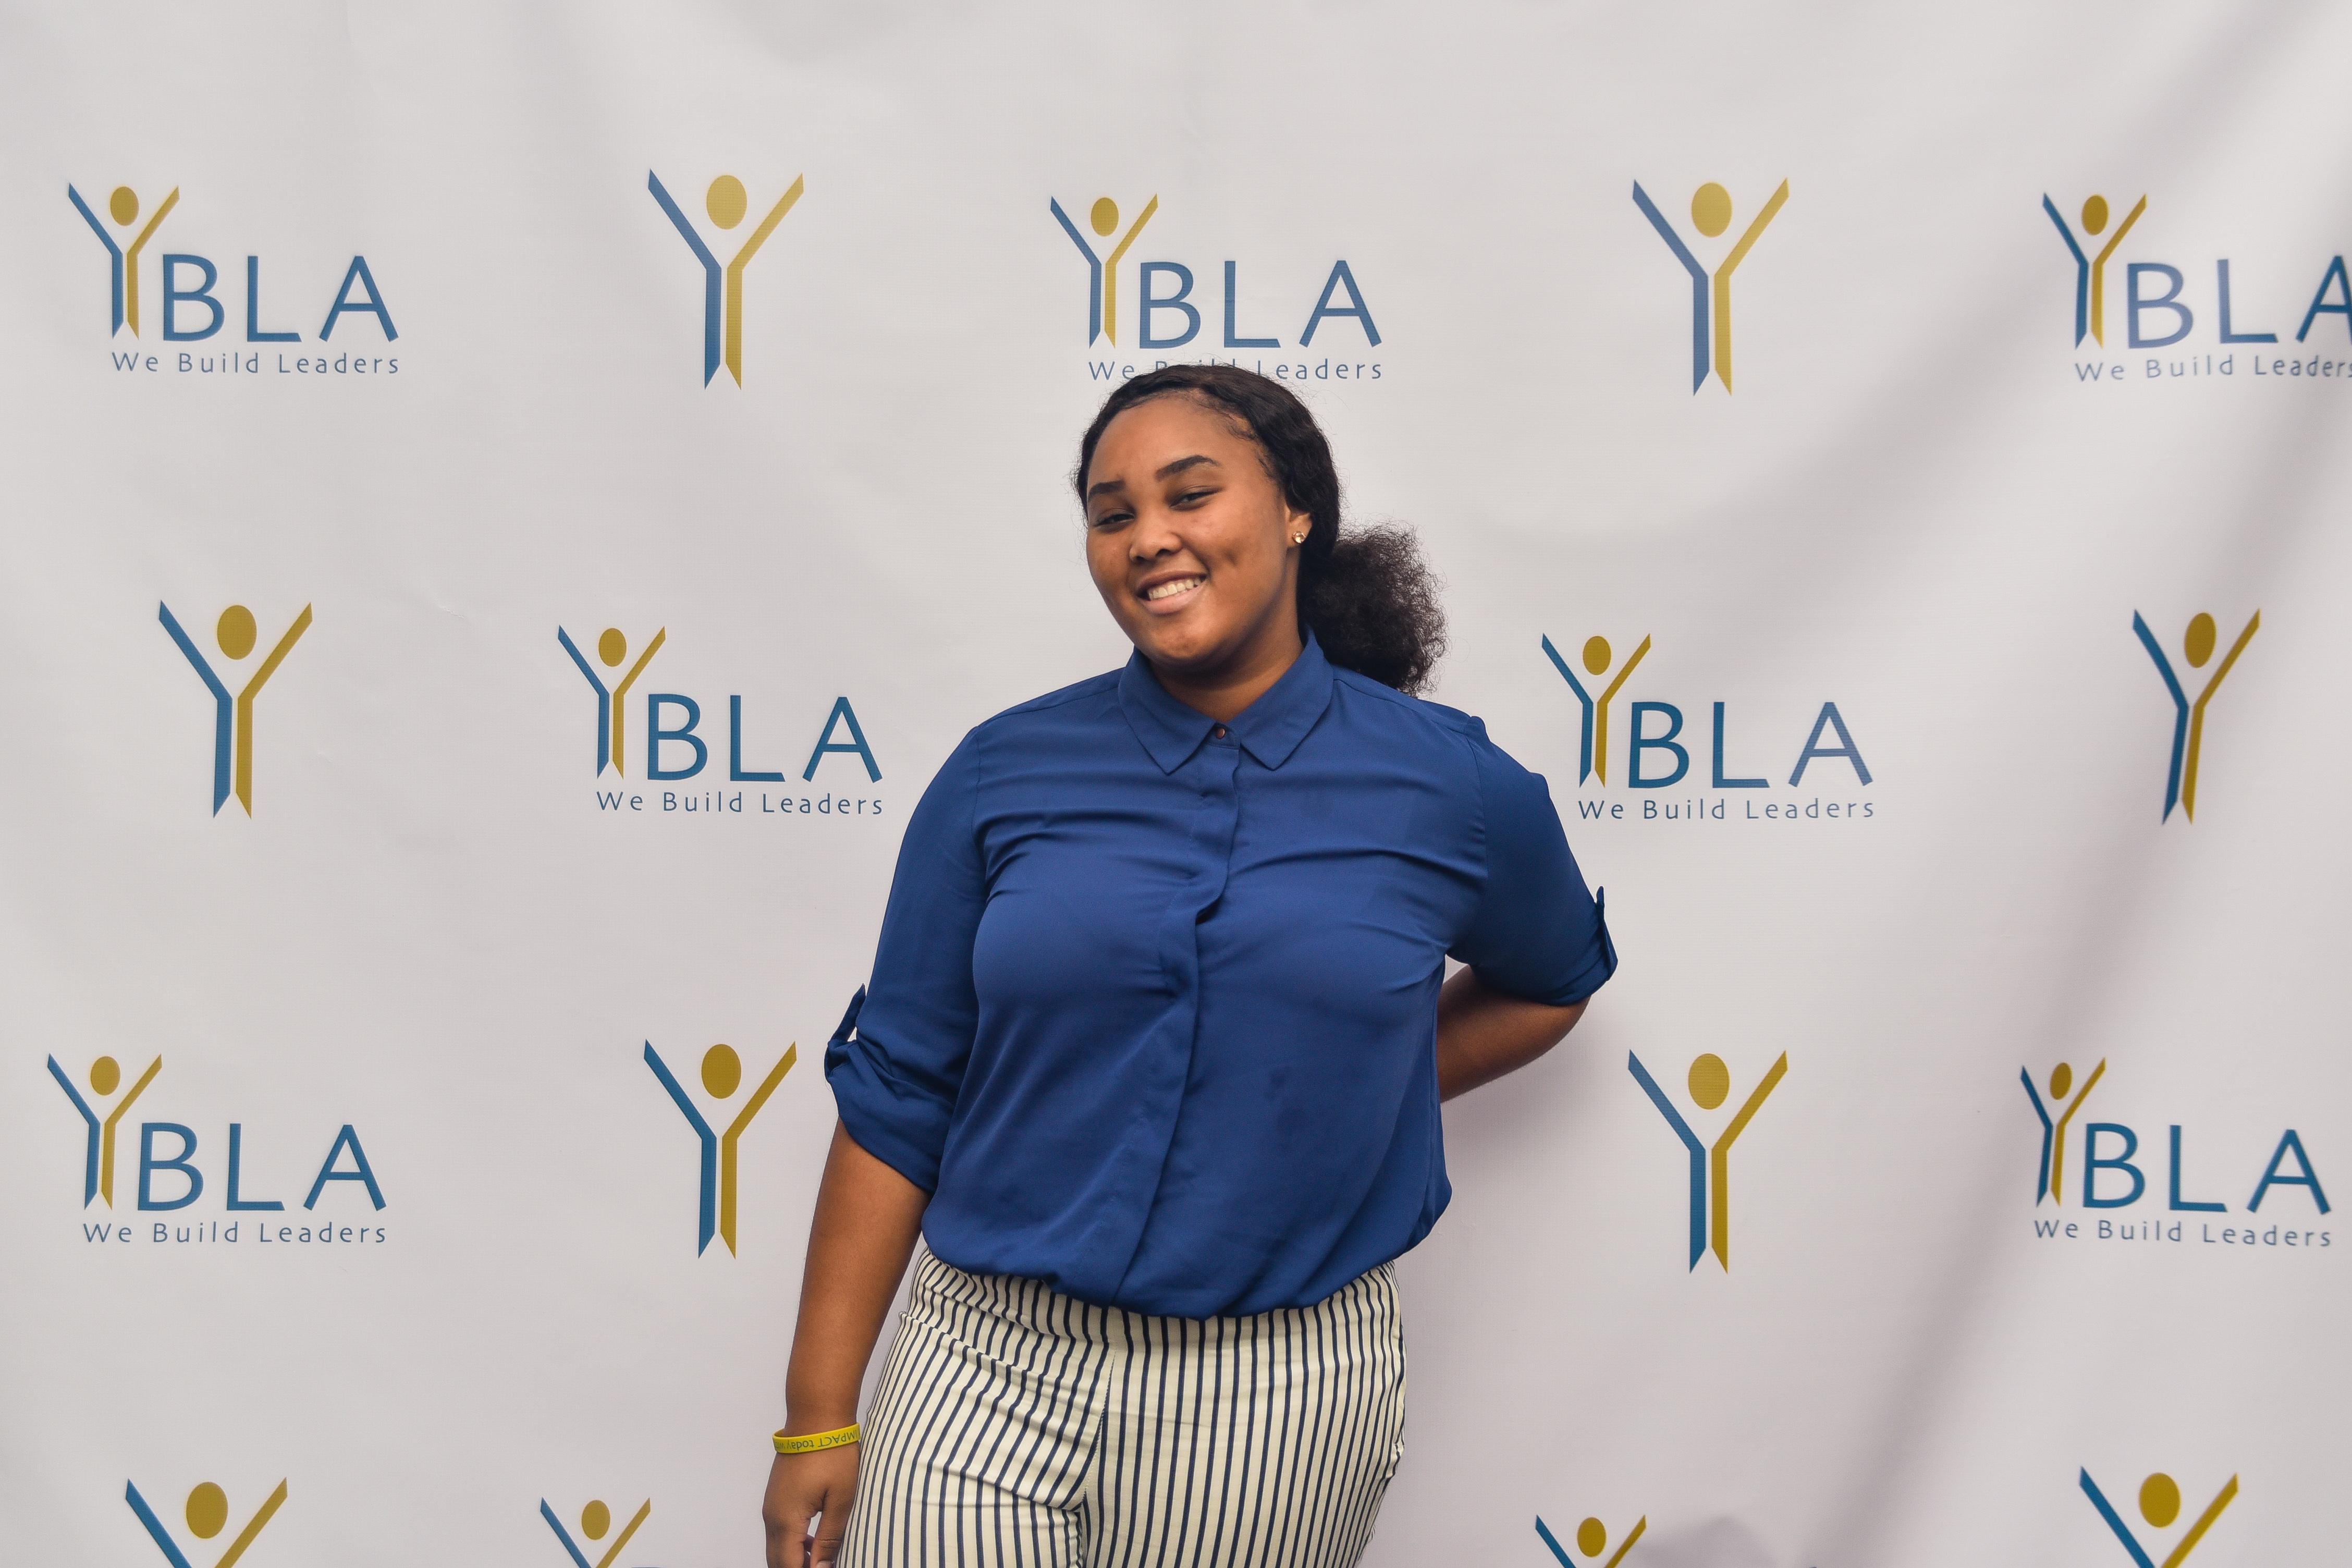 YBLA-Young_Black_Leadership_Alliance-Con